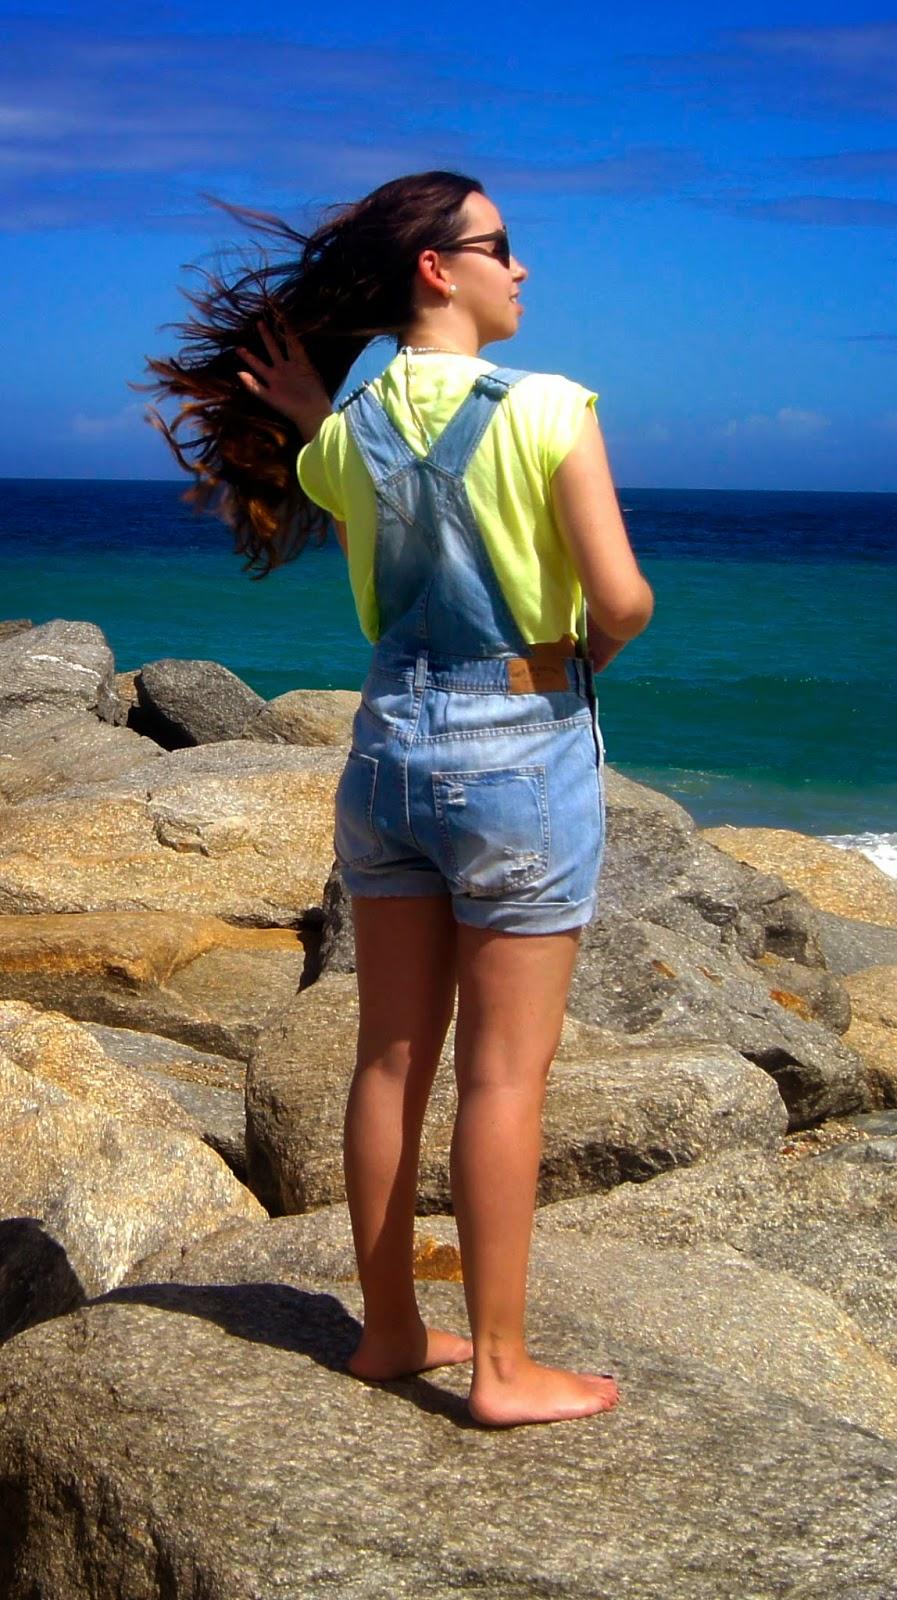 hey vicky hey, victoria suarez, beach, playa, fashion blogger, girl beach, peto vaquero, overol de jean, jean overall